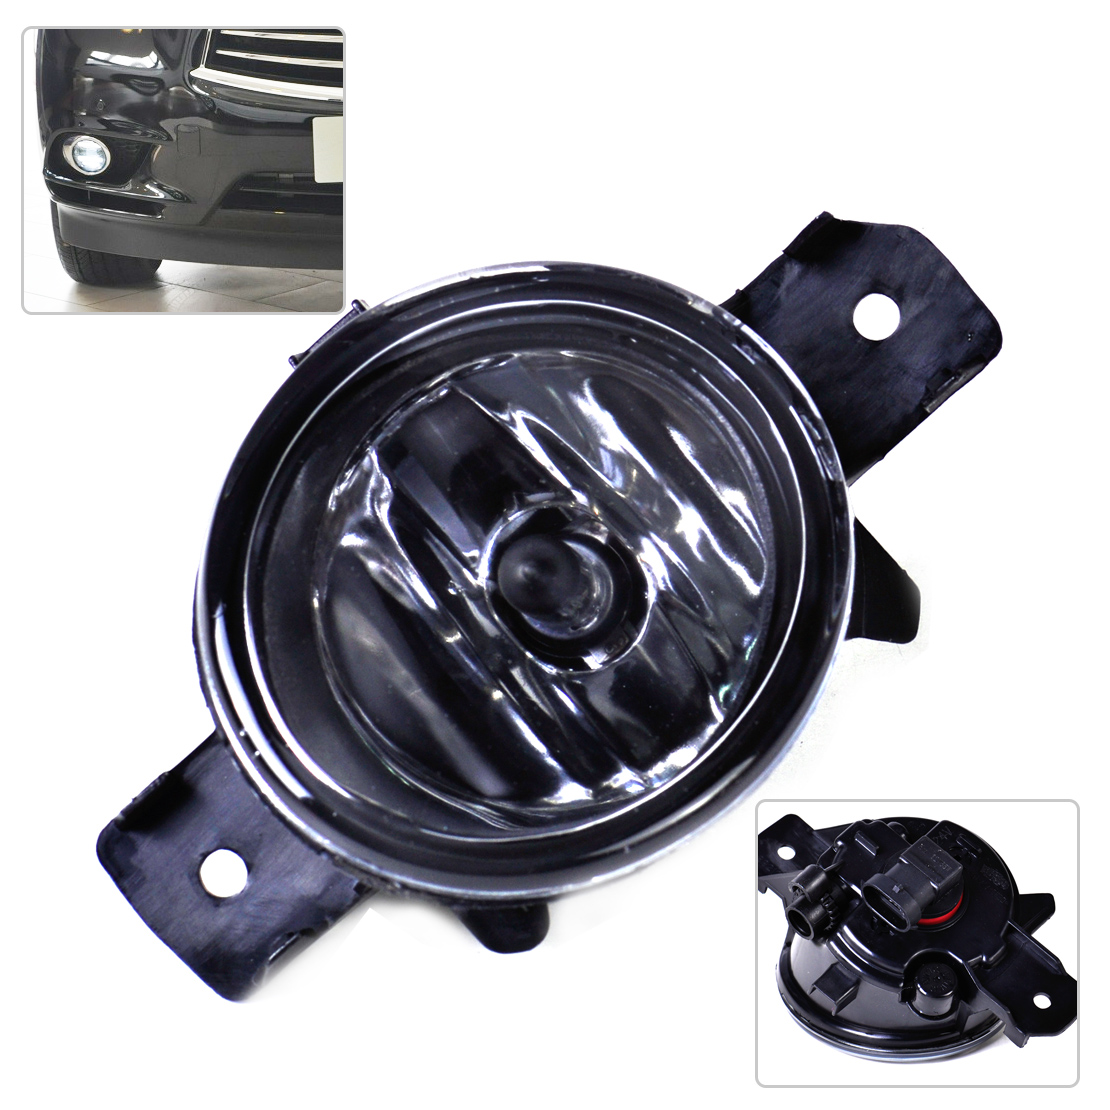 Right Fog Light Lamp +H11 Halogen Bulb 26150-89927 NI2593117 Fit for Nissan Pathfinder Sentra Murano Rogue Infiniti M35 M45 JX35